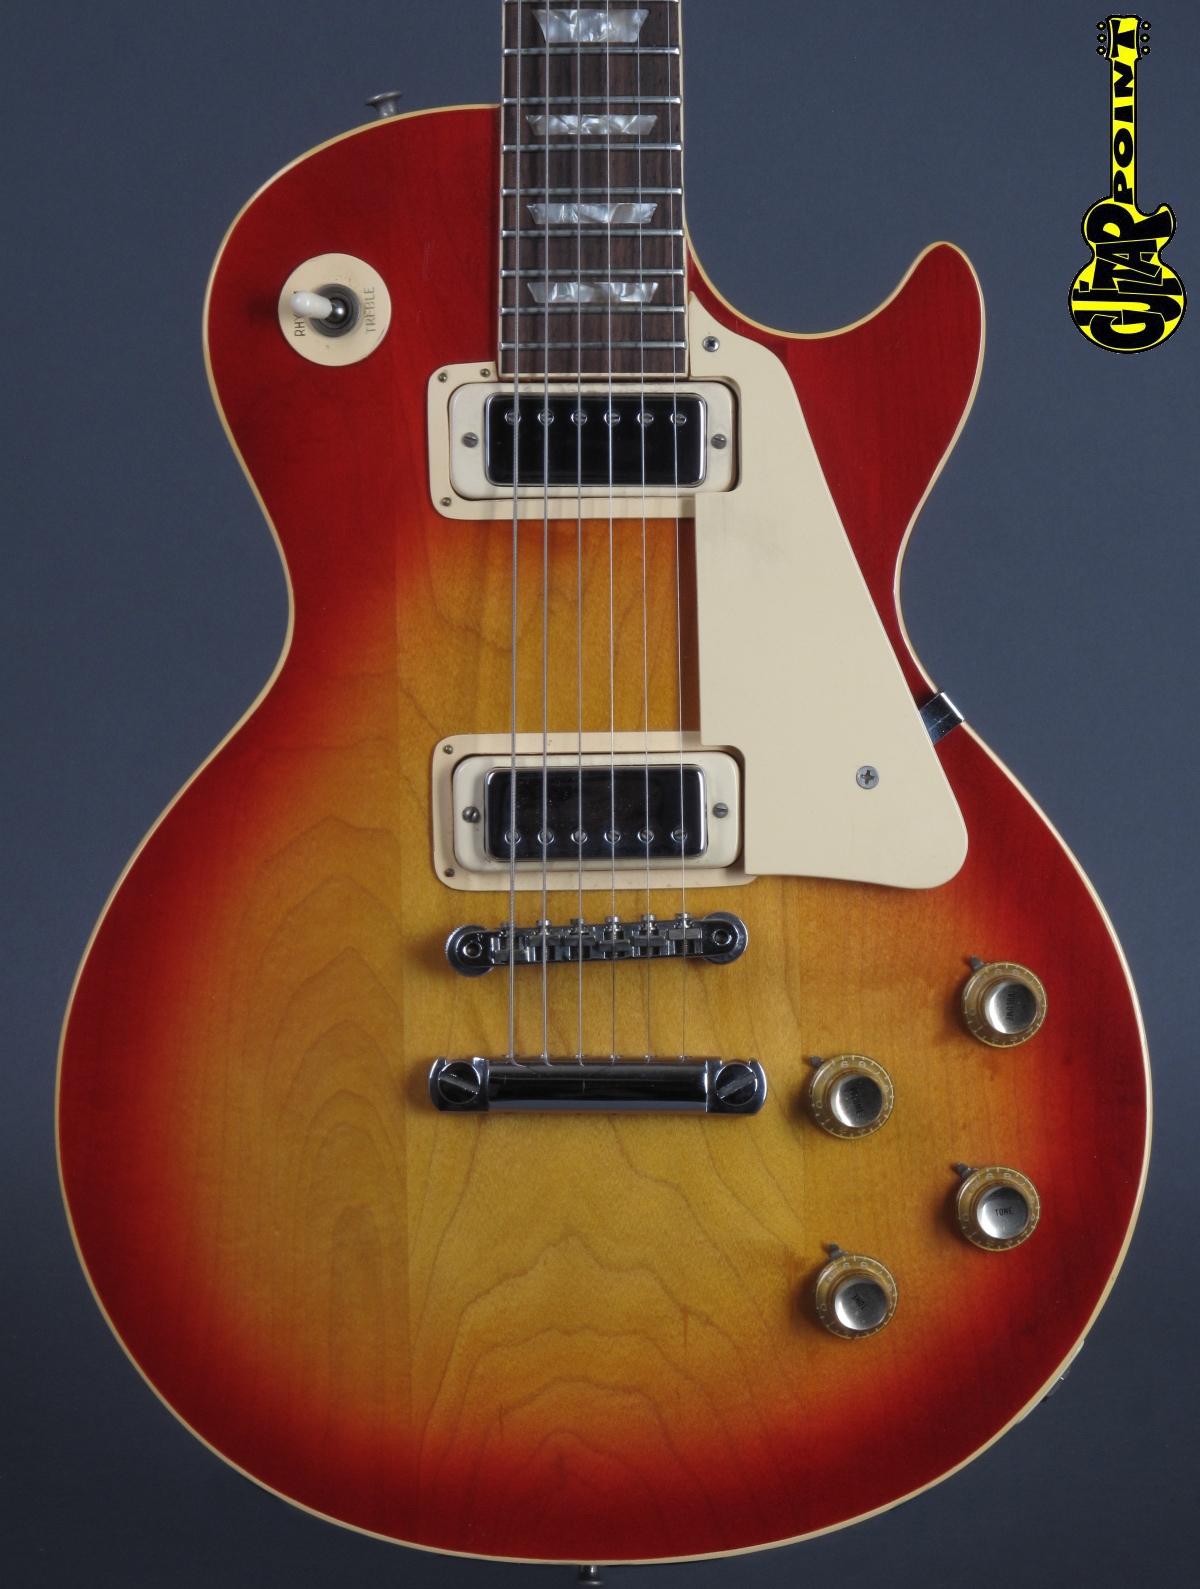 1974 Gibson Les Paul Deluxe - Cherry Sunburst  ...minty !!!